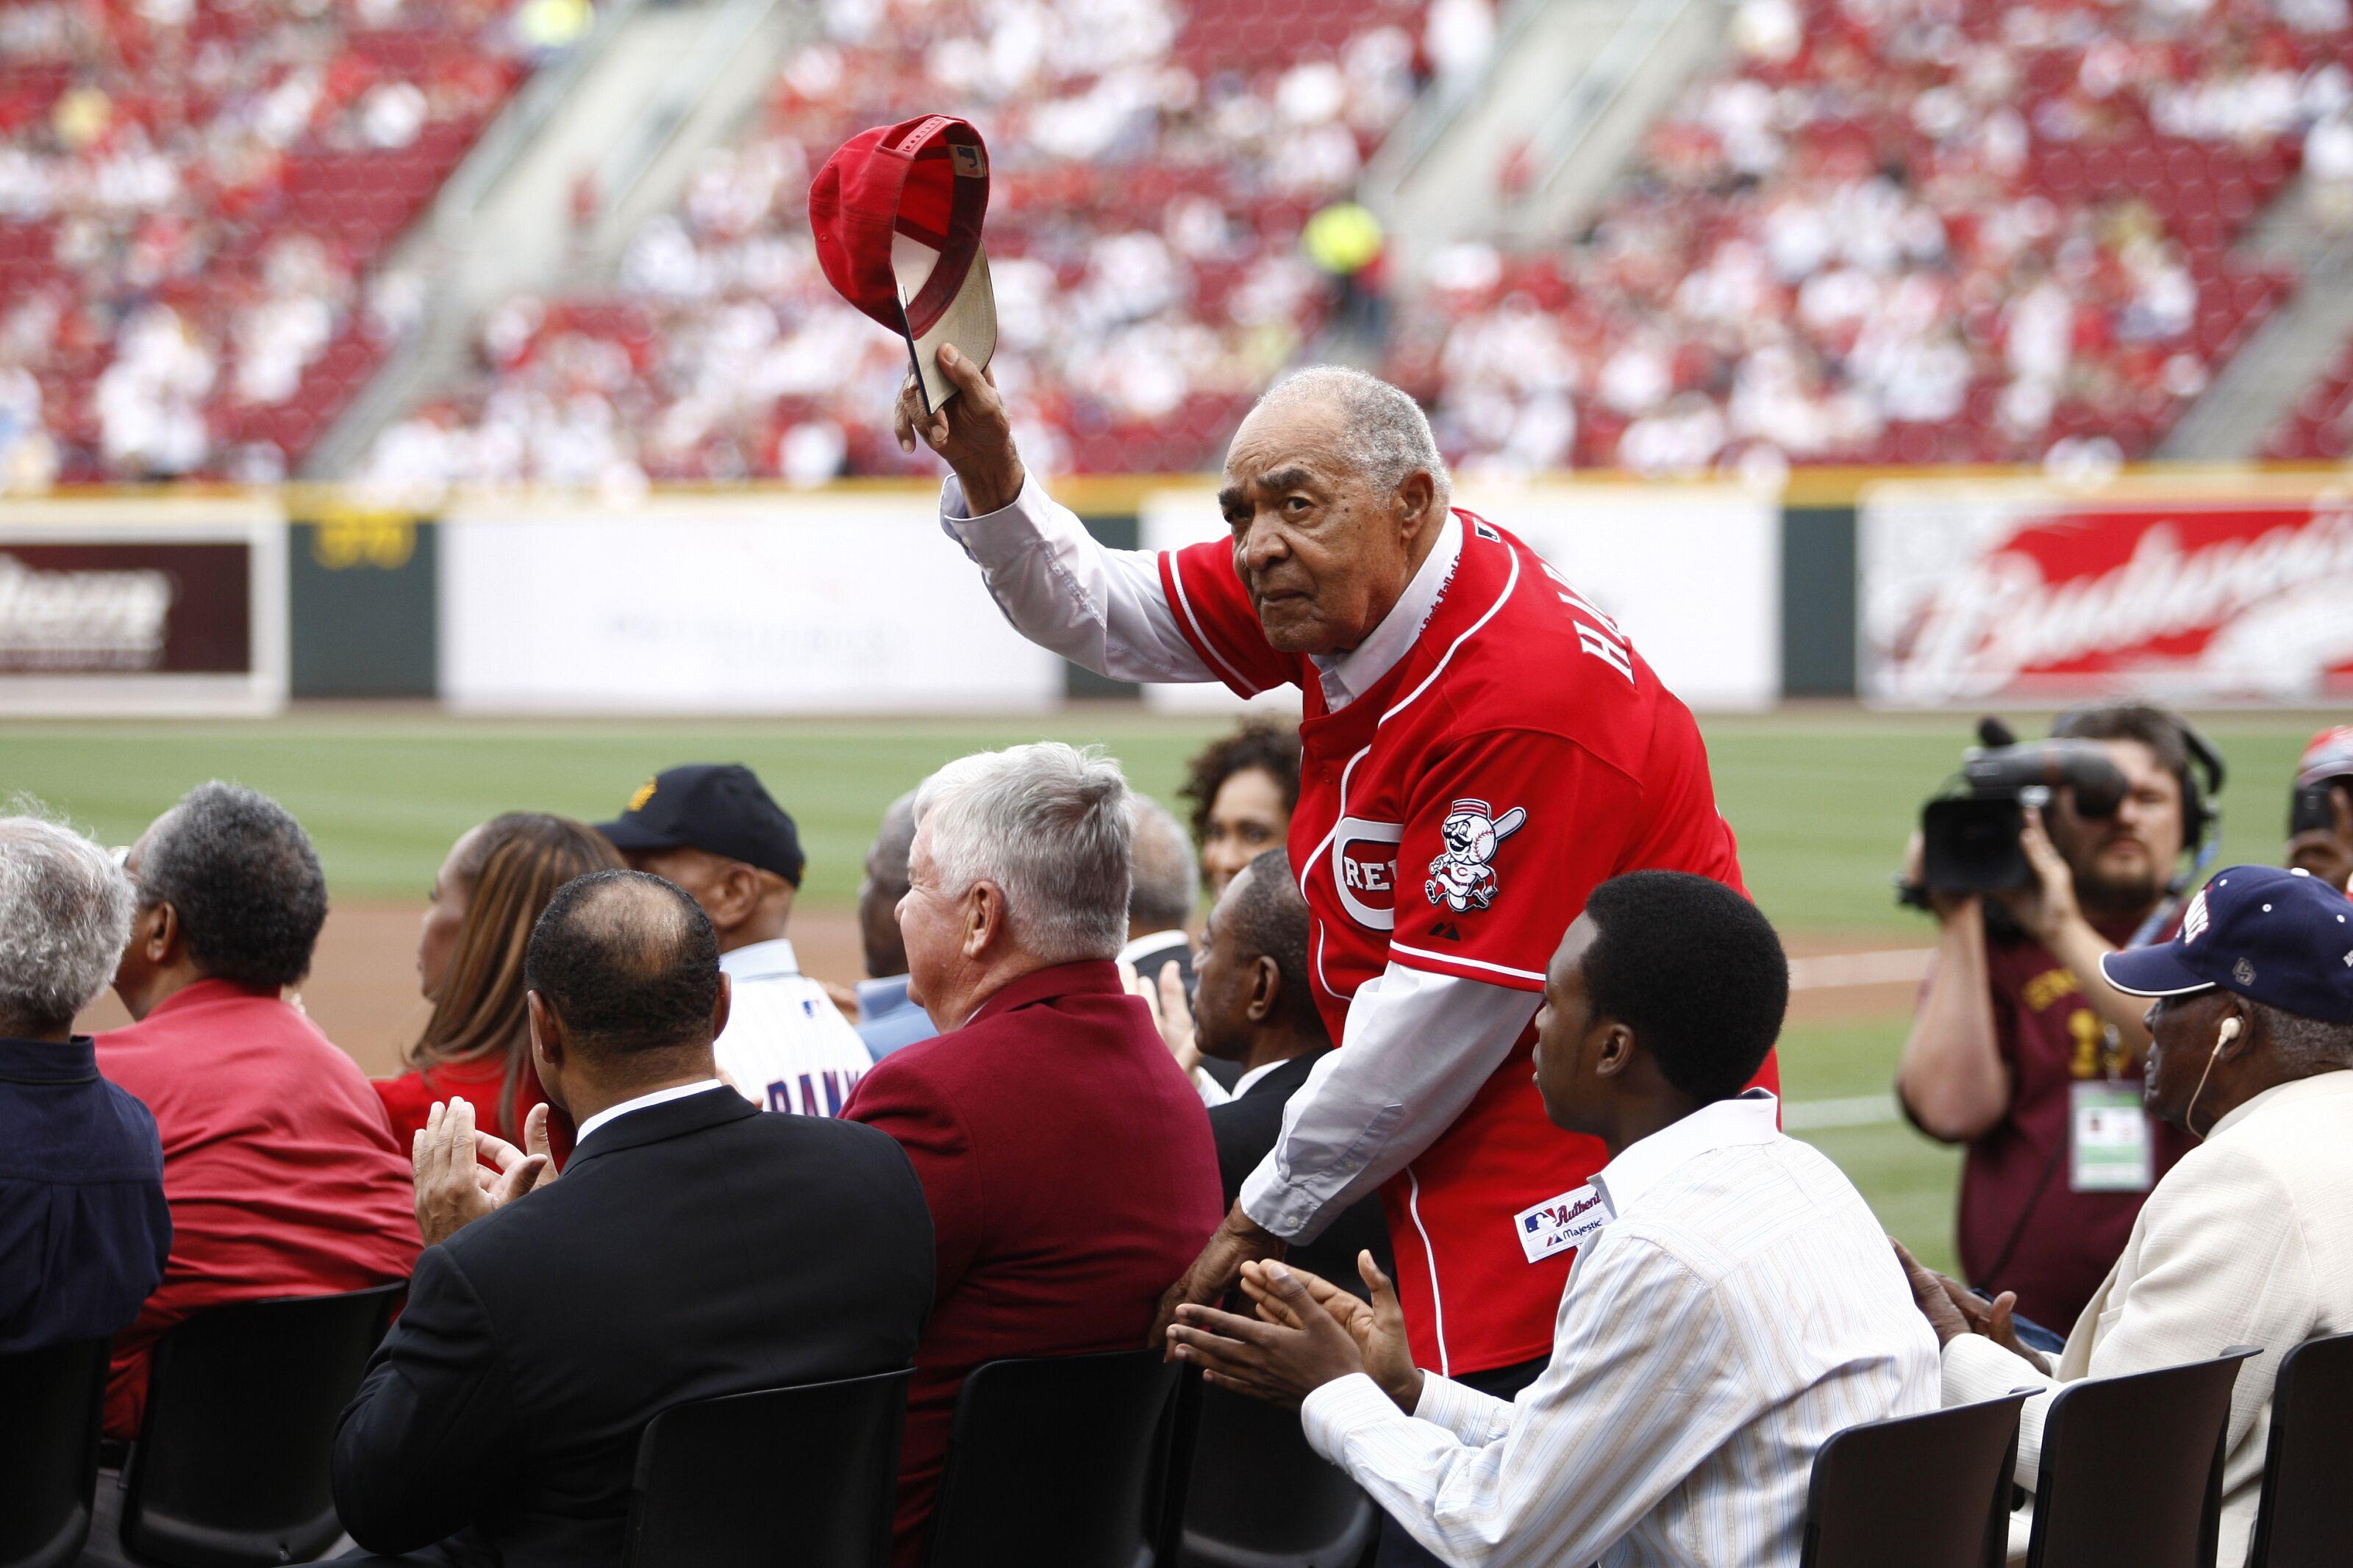 Cincinnati Reds: Chuck Harmon passes away at 94 years old